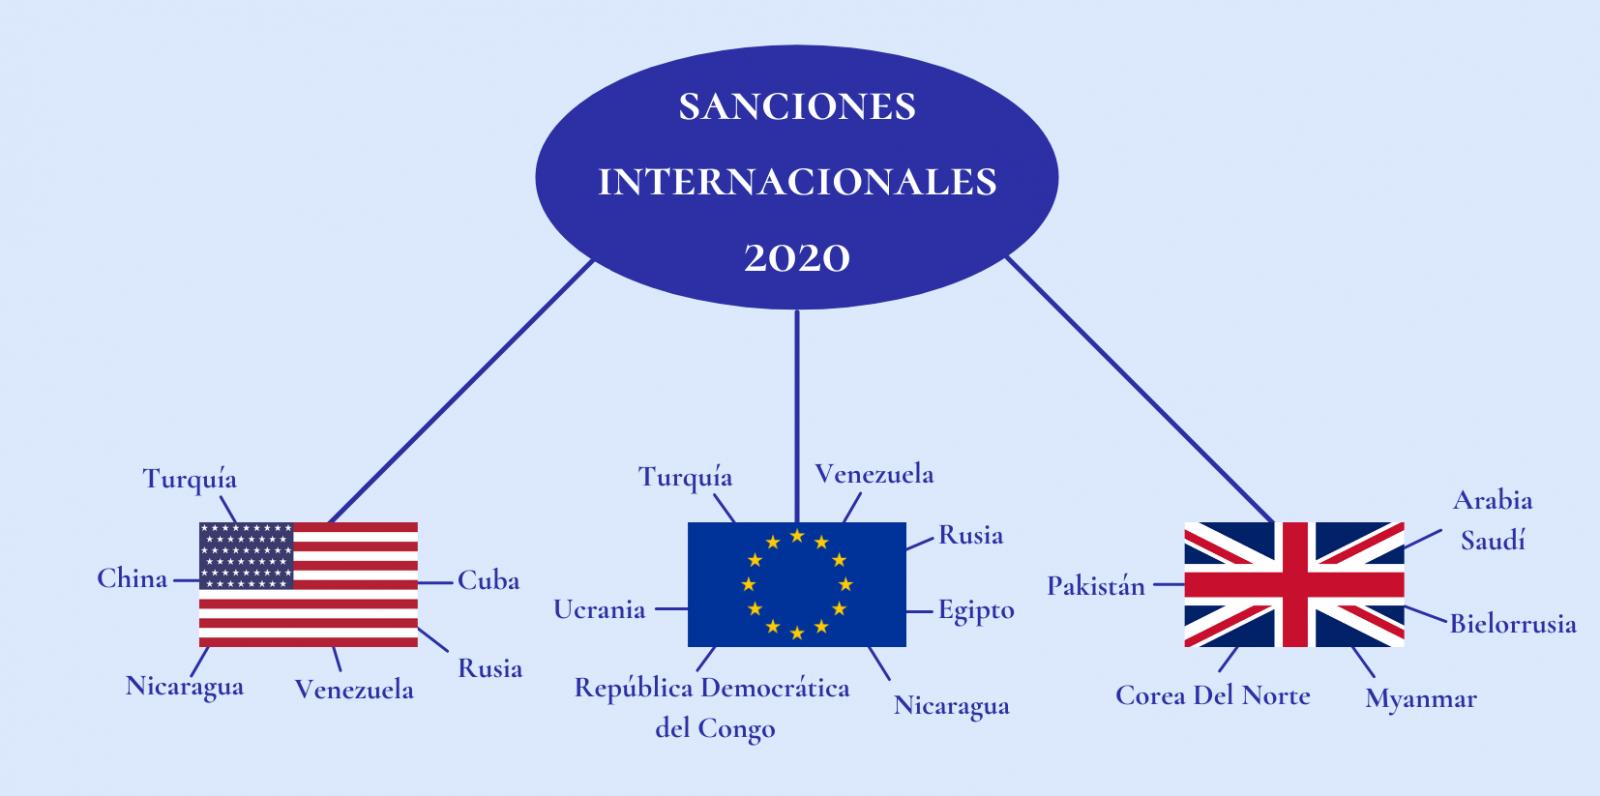 International Sanctions 2020